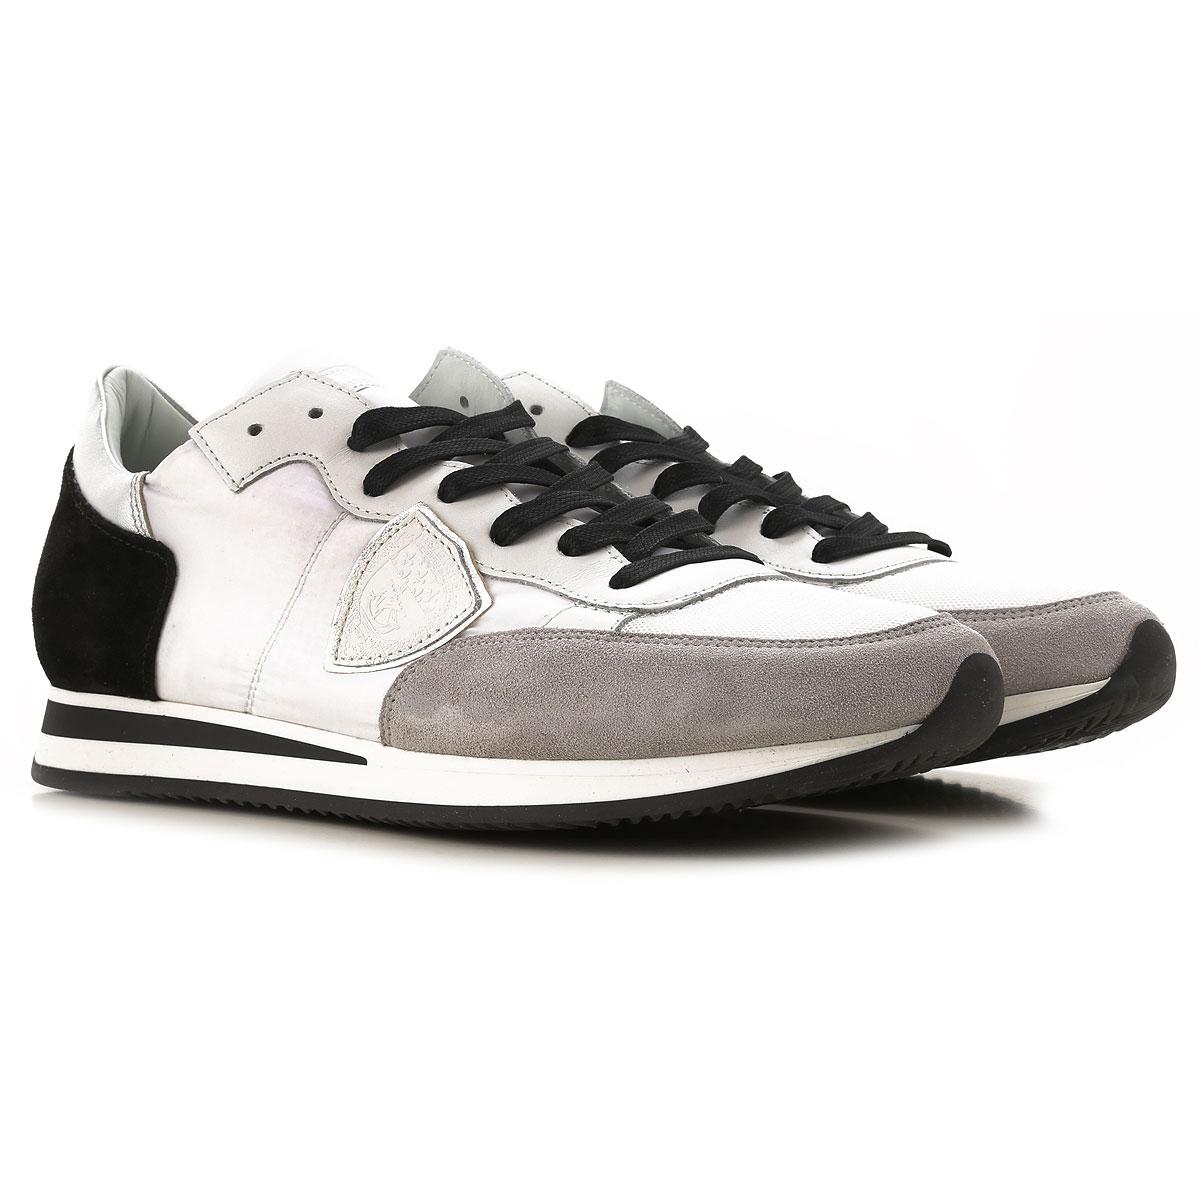 Philippe Model Sneakers voor Mannen In Aanbieding, Wit, Leder, 2019, 41 42 43